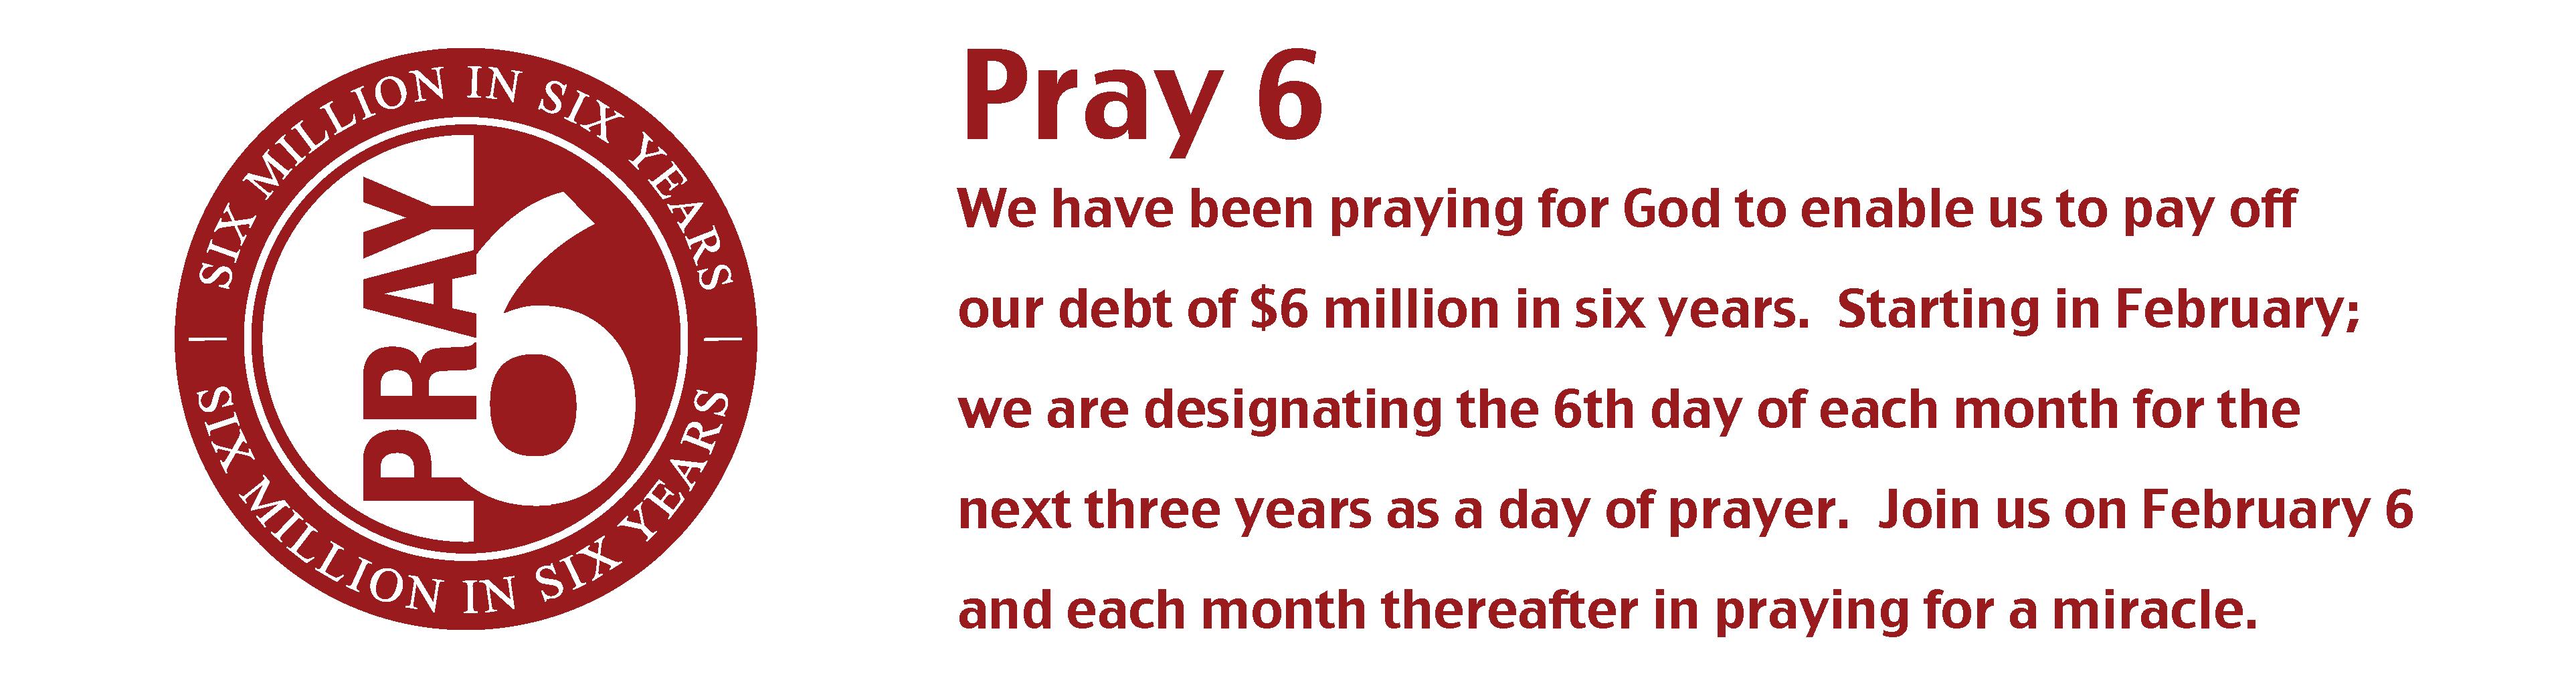 Pray6_SubHeader-01